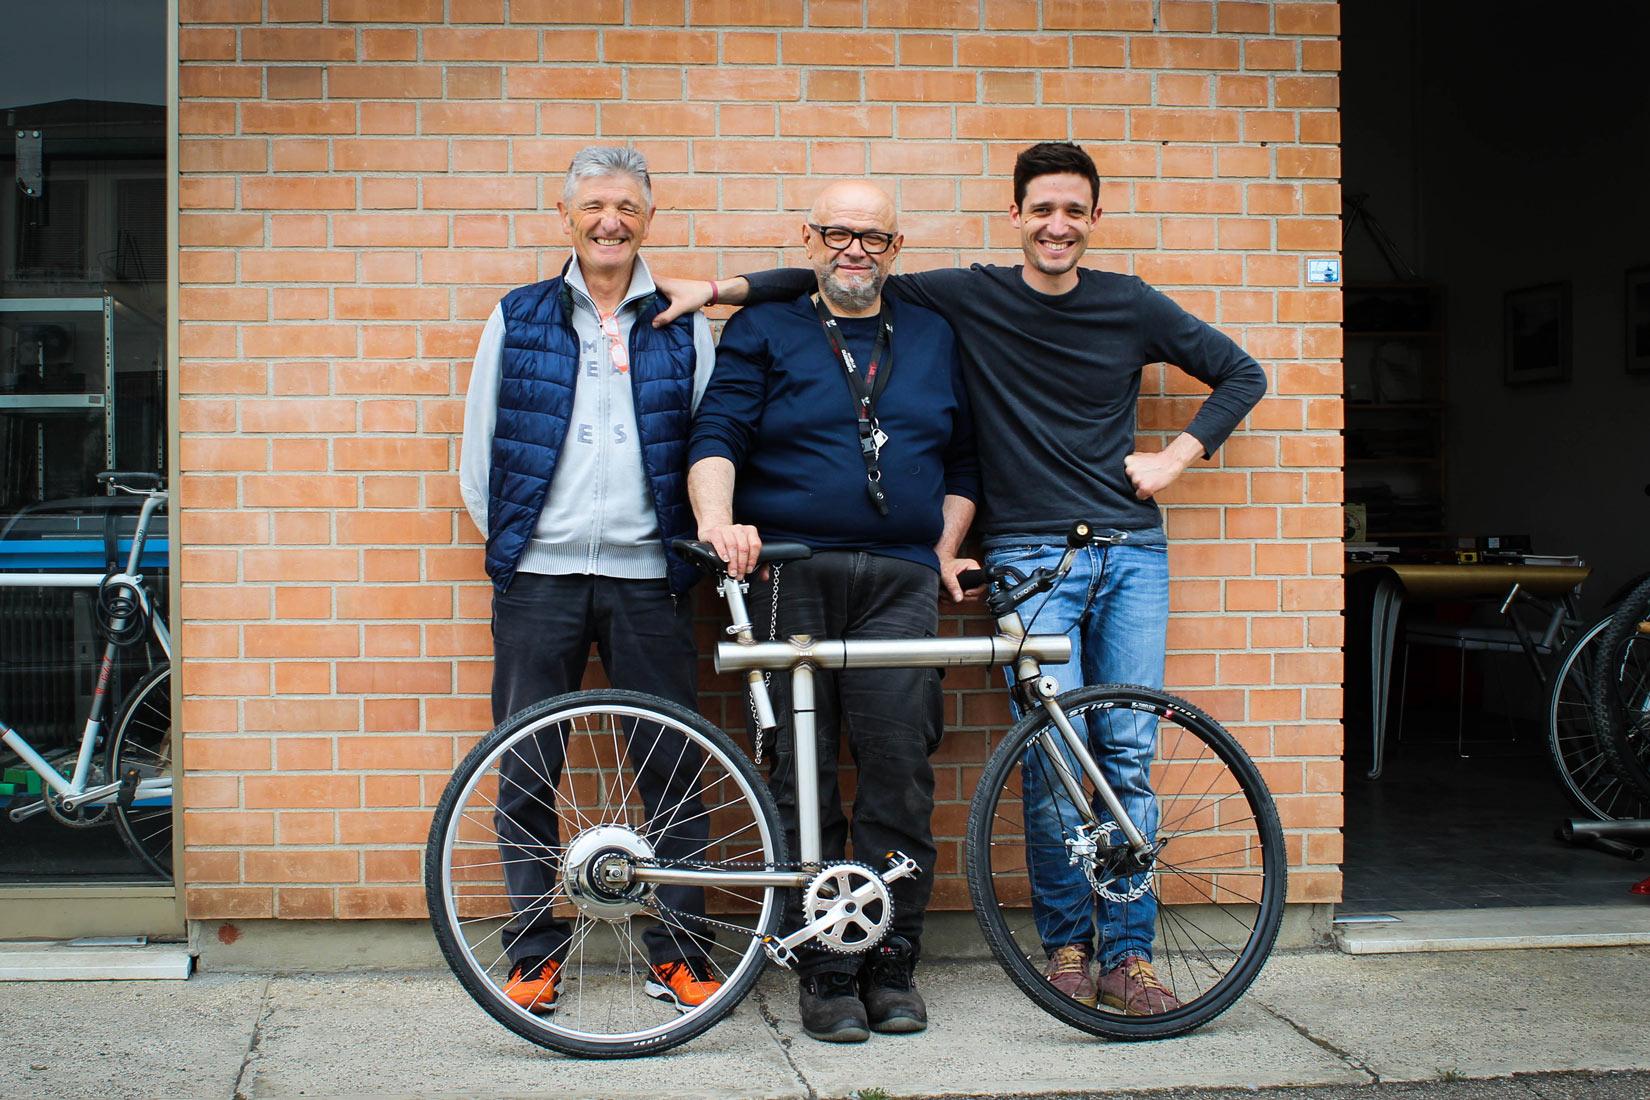 erman plus bike 2.0 prototype